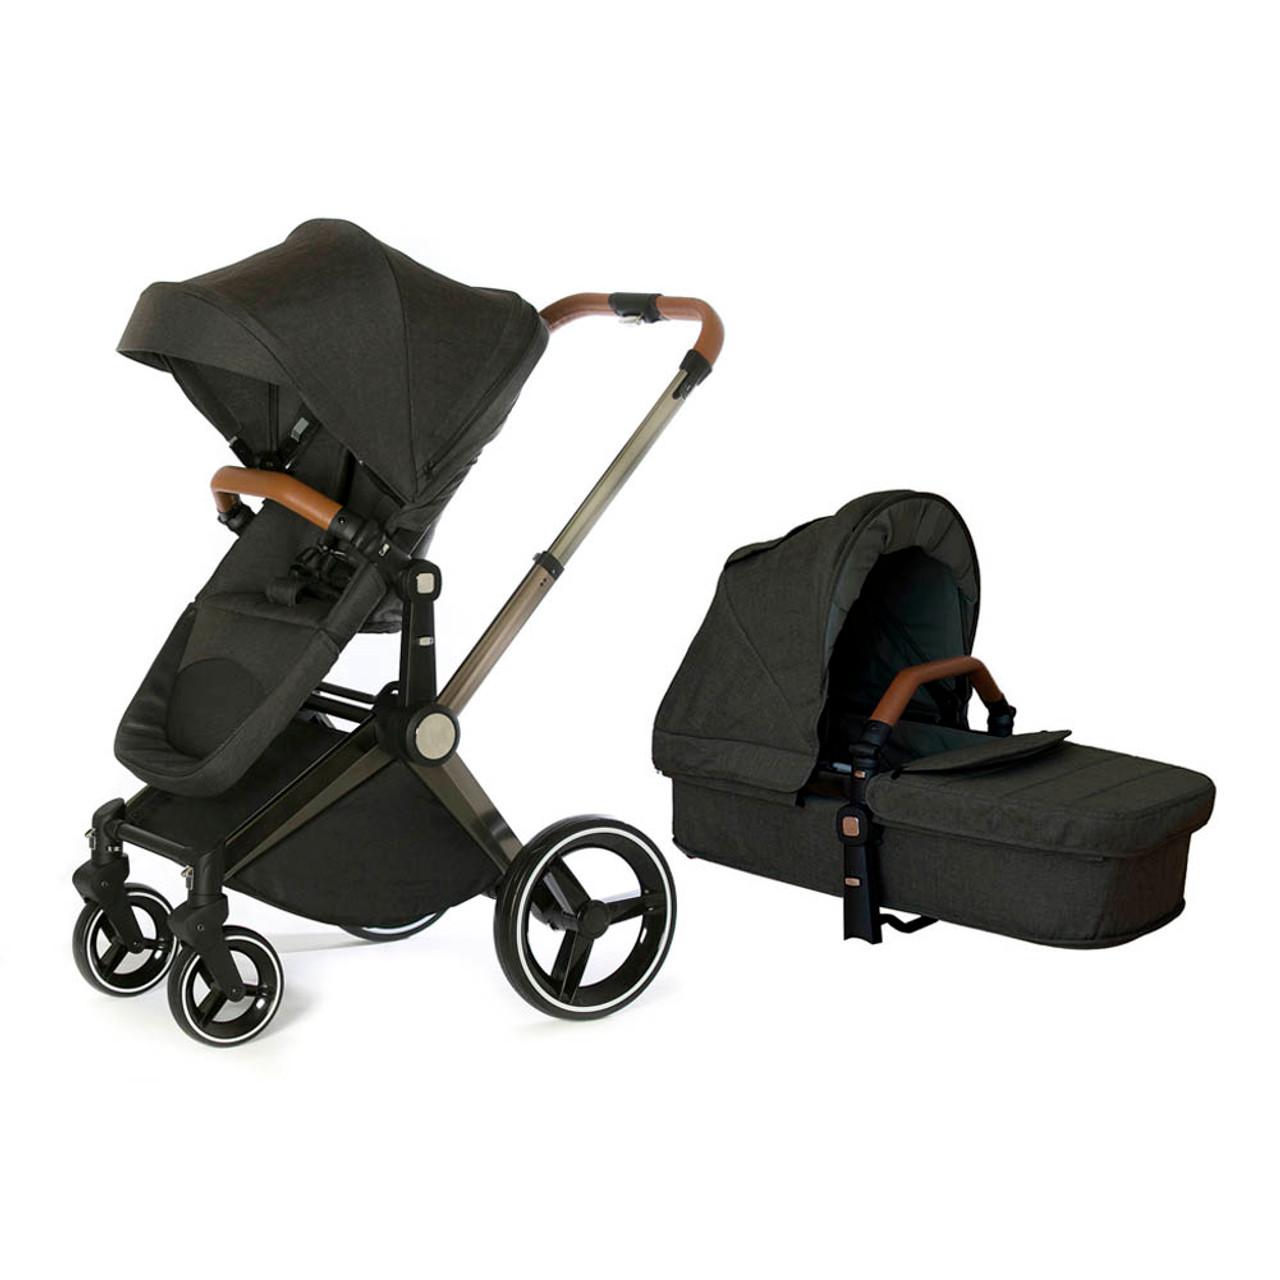 Venice Child Kangaroo Stroller Charcoal